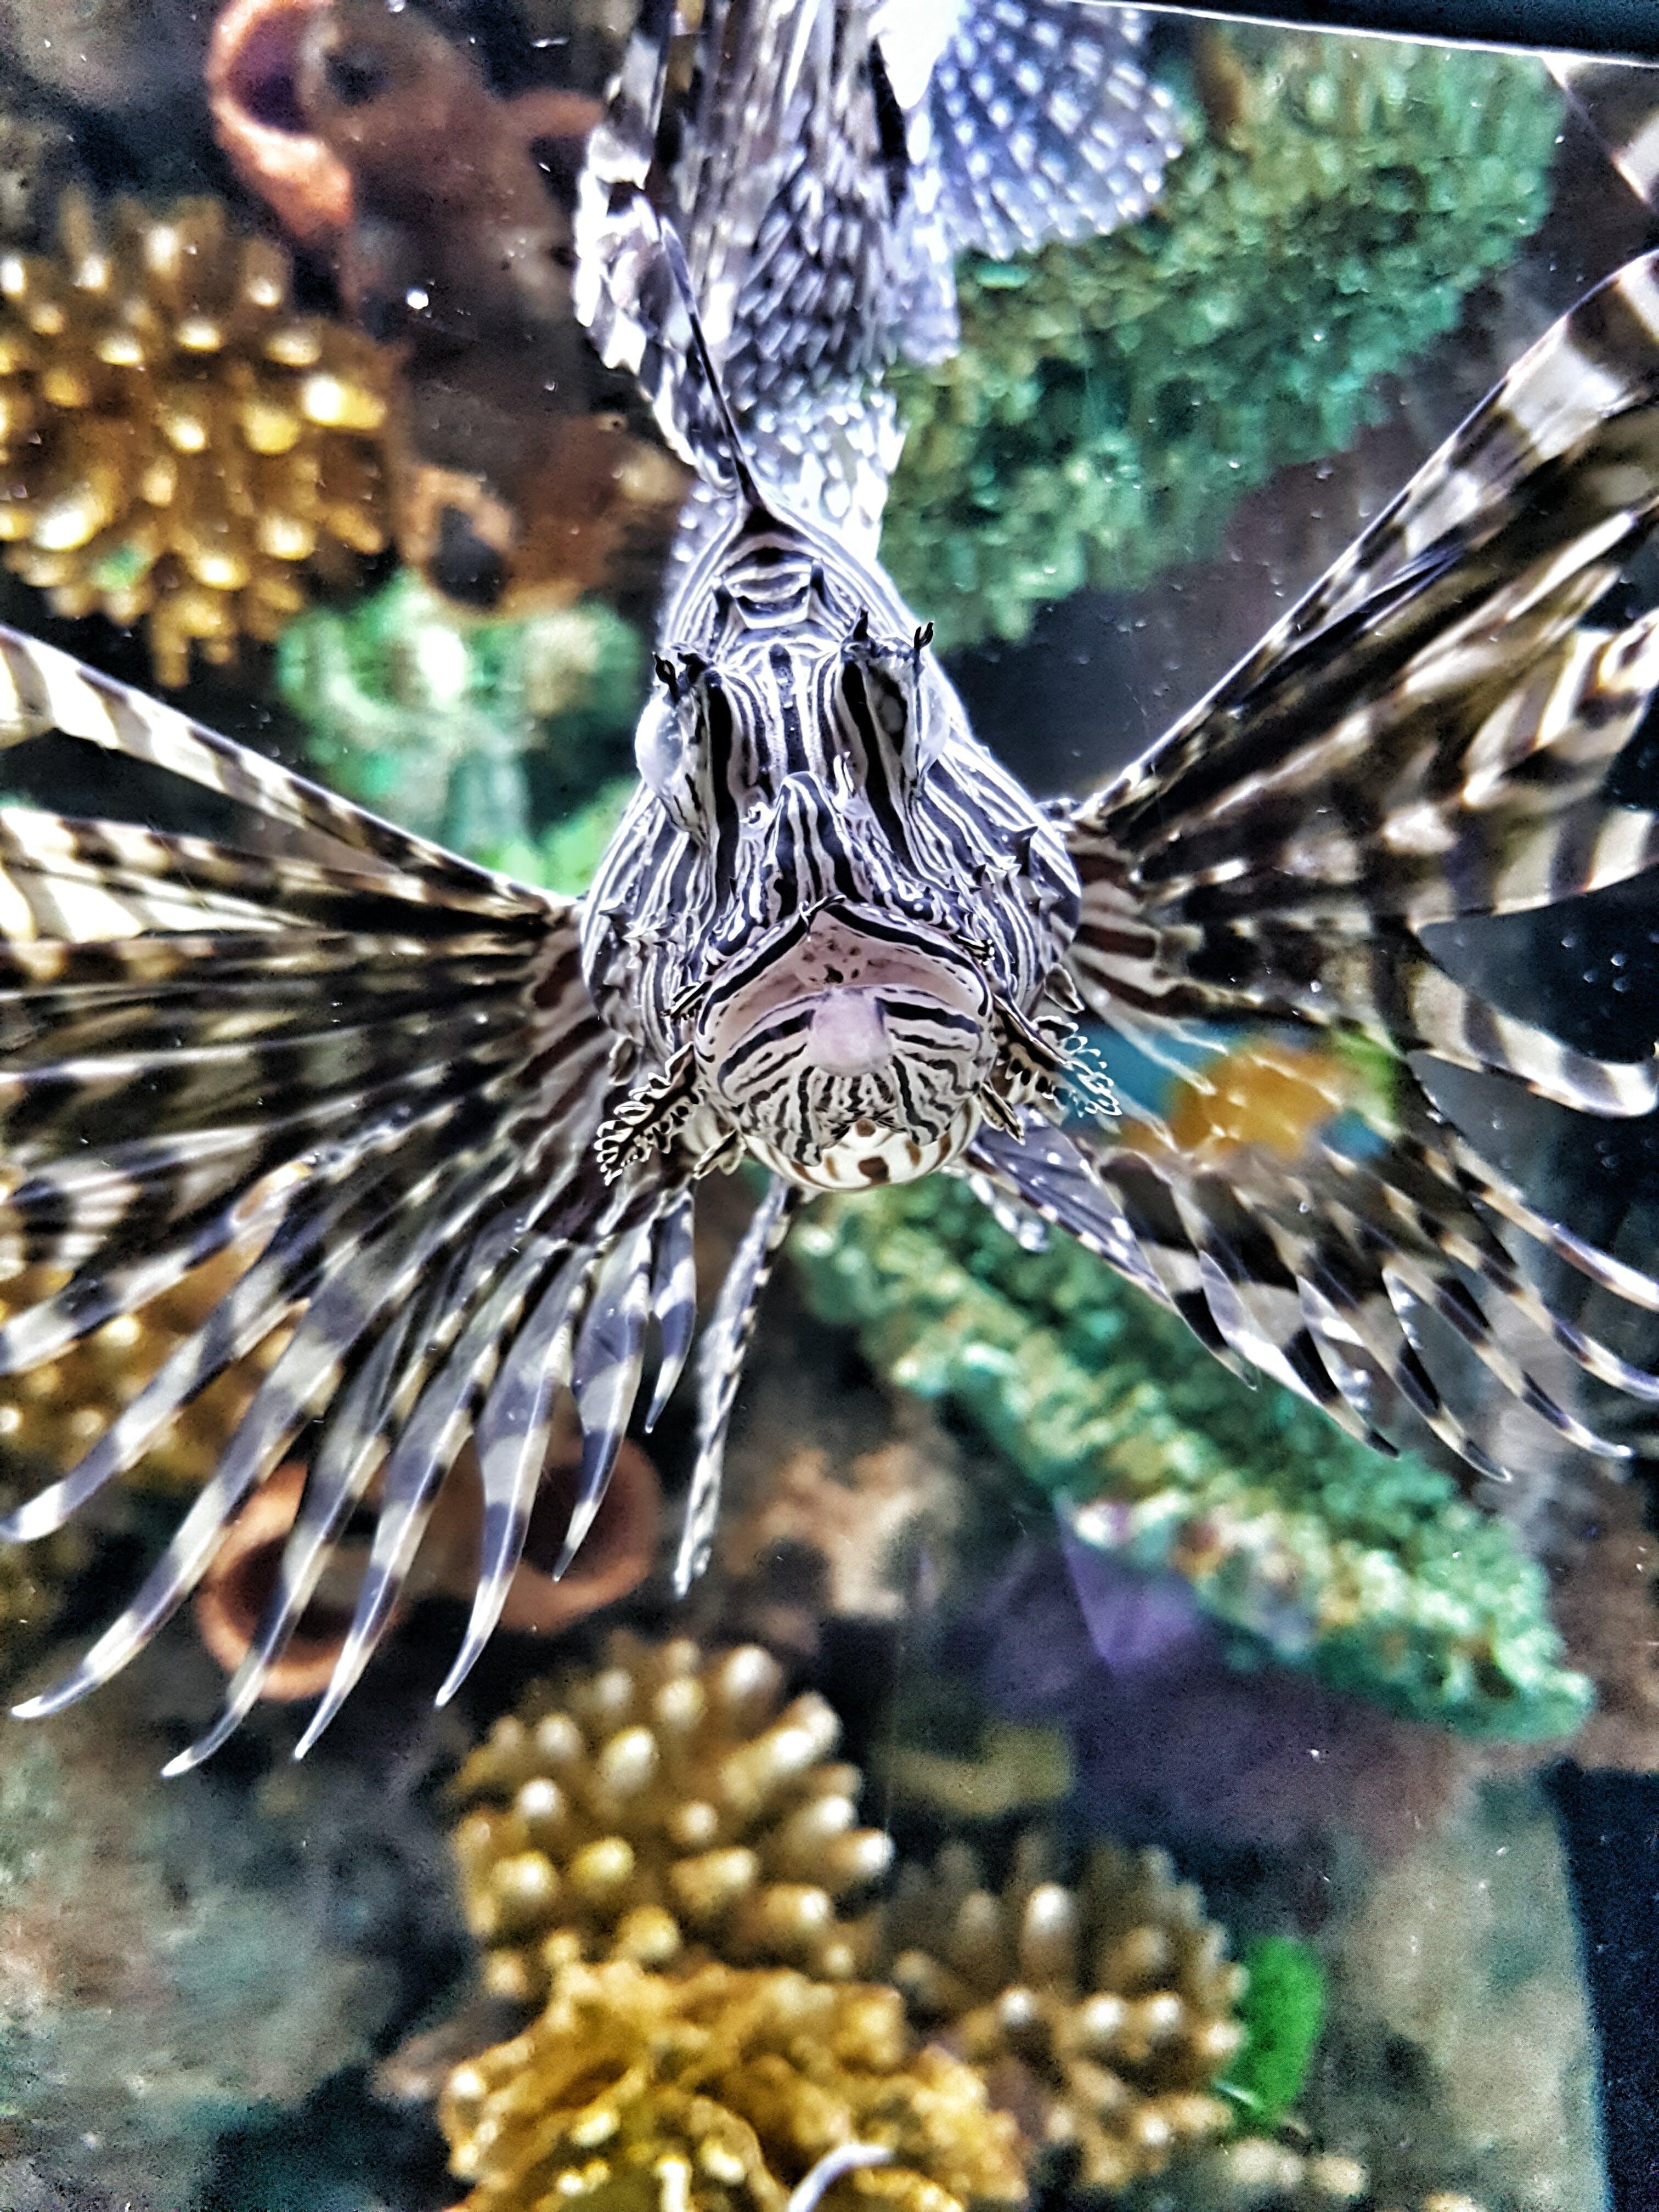 Free stock photo of animal, lionfish, nature, poisonous